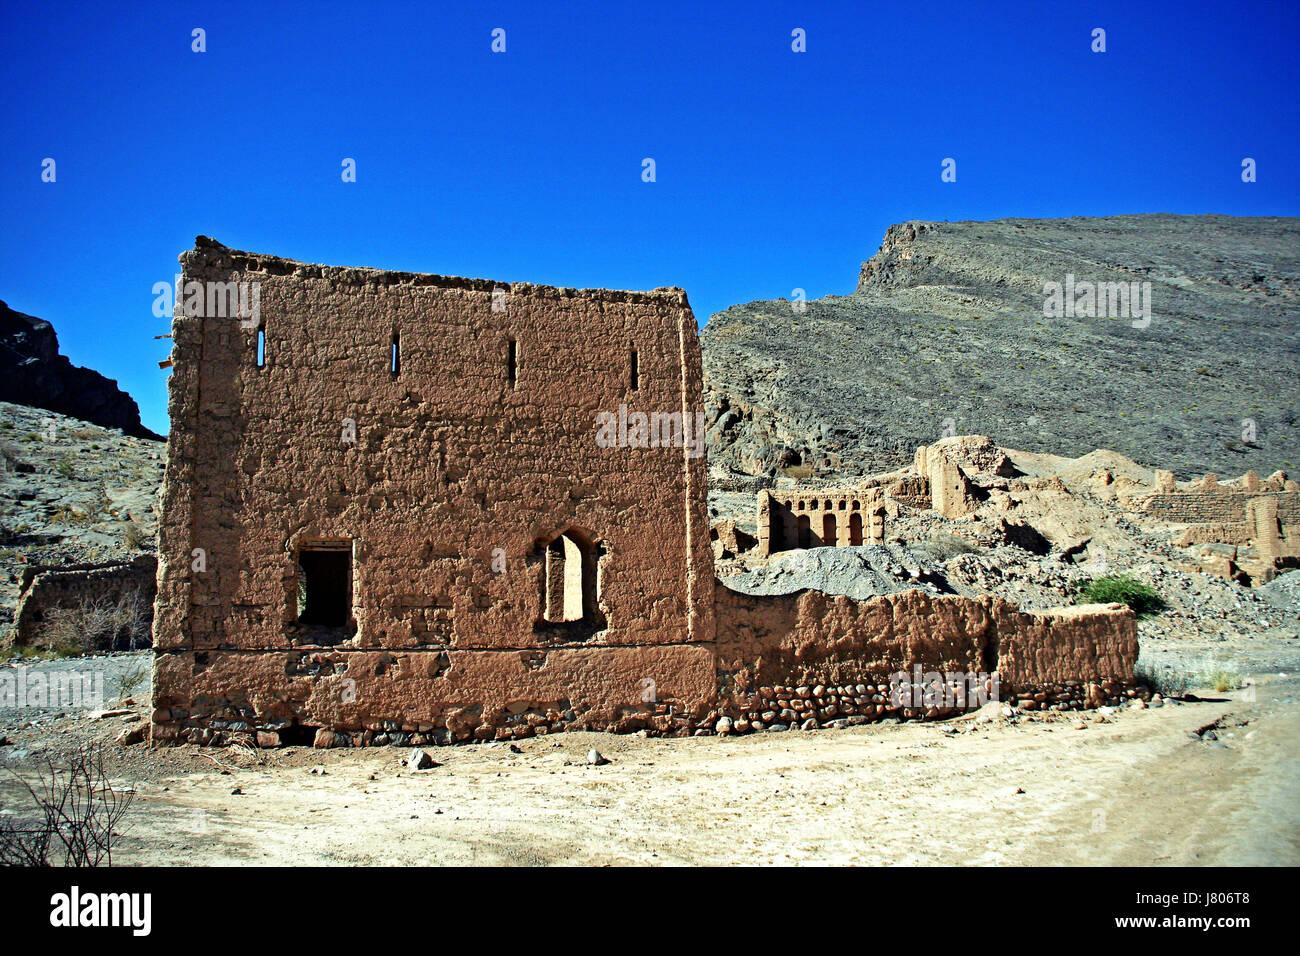 Ruined mud brick buildings, Tanuf, Oman - Stock Image